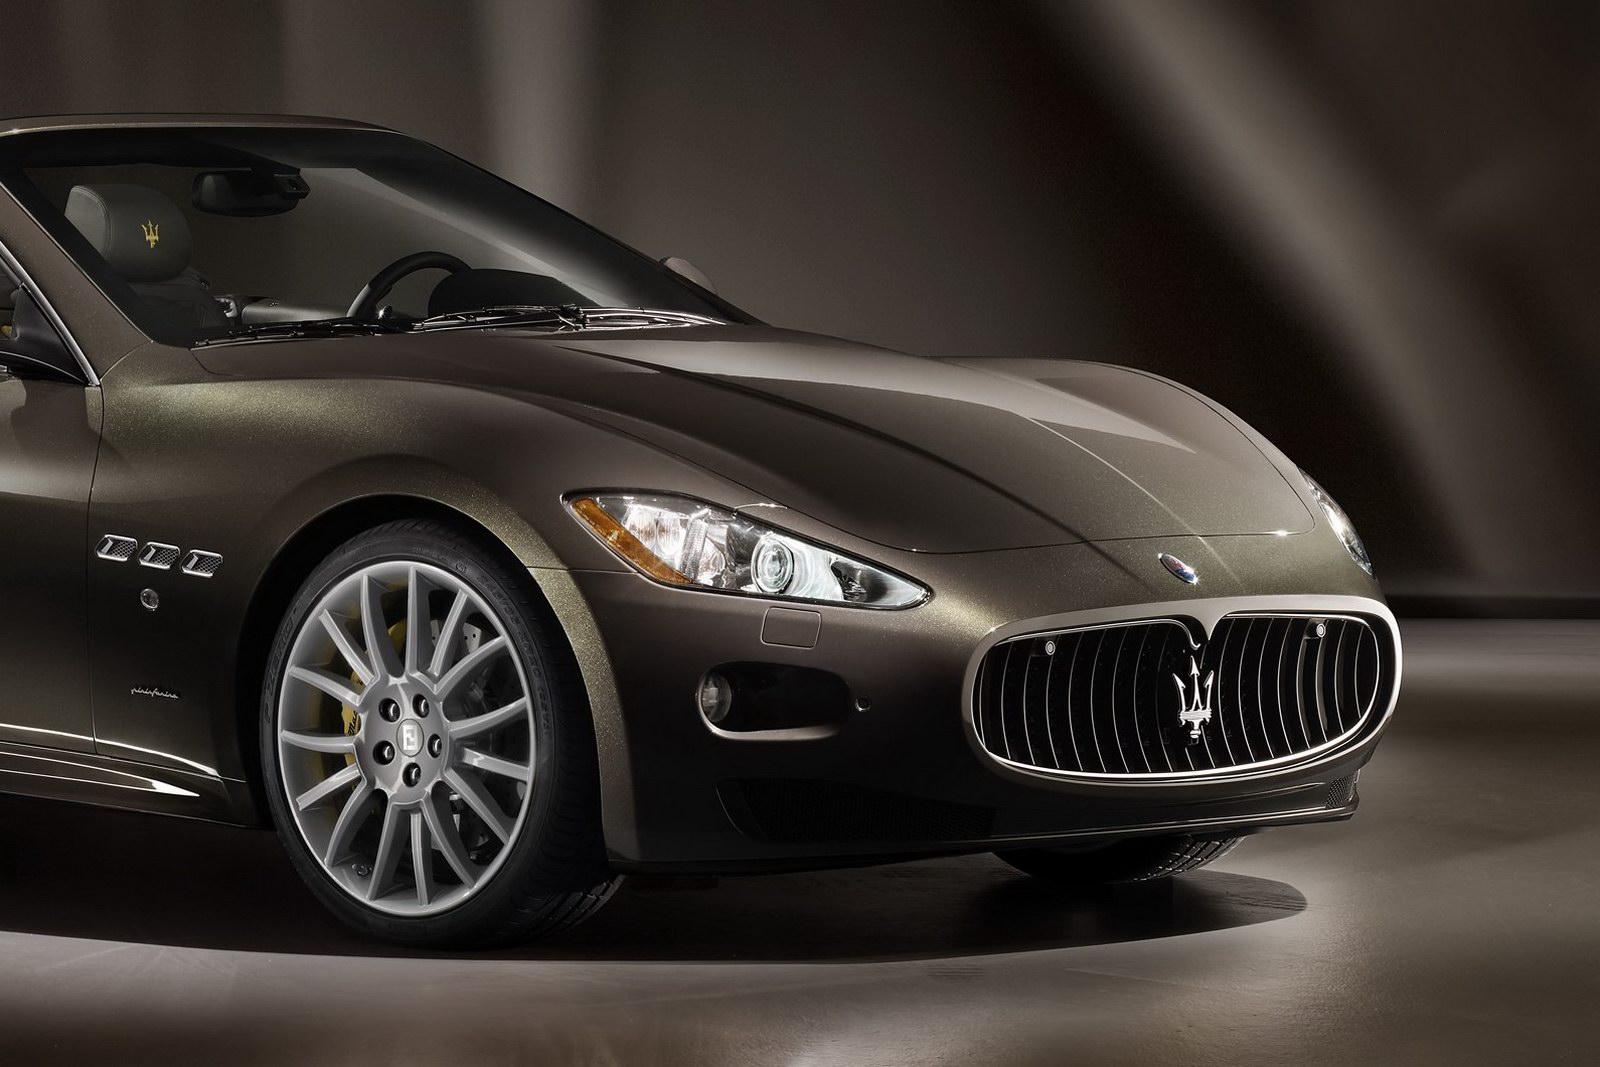 Sport Cars Maserati Grancabrio Fendi 2012 Nice Car